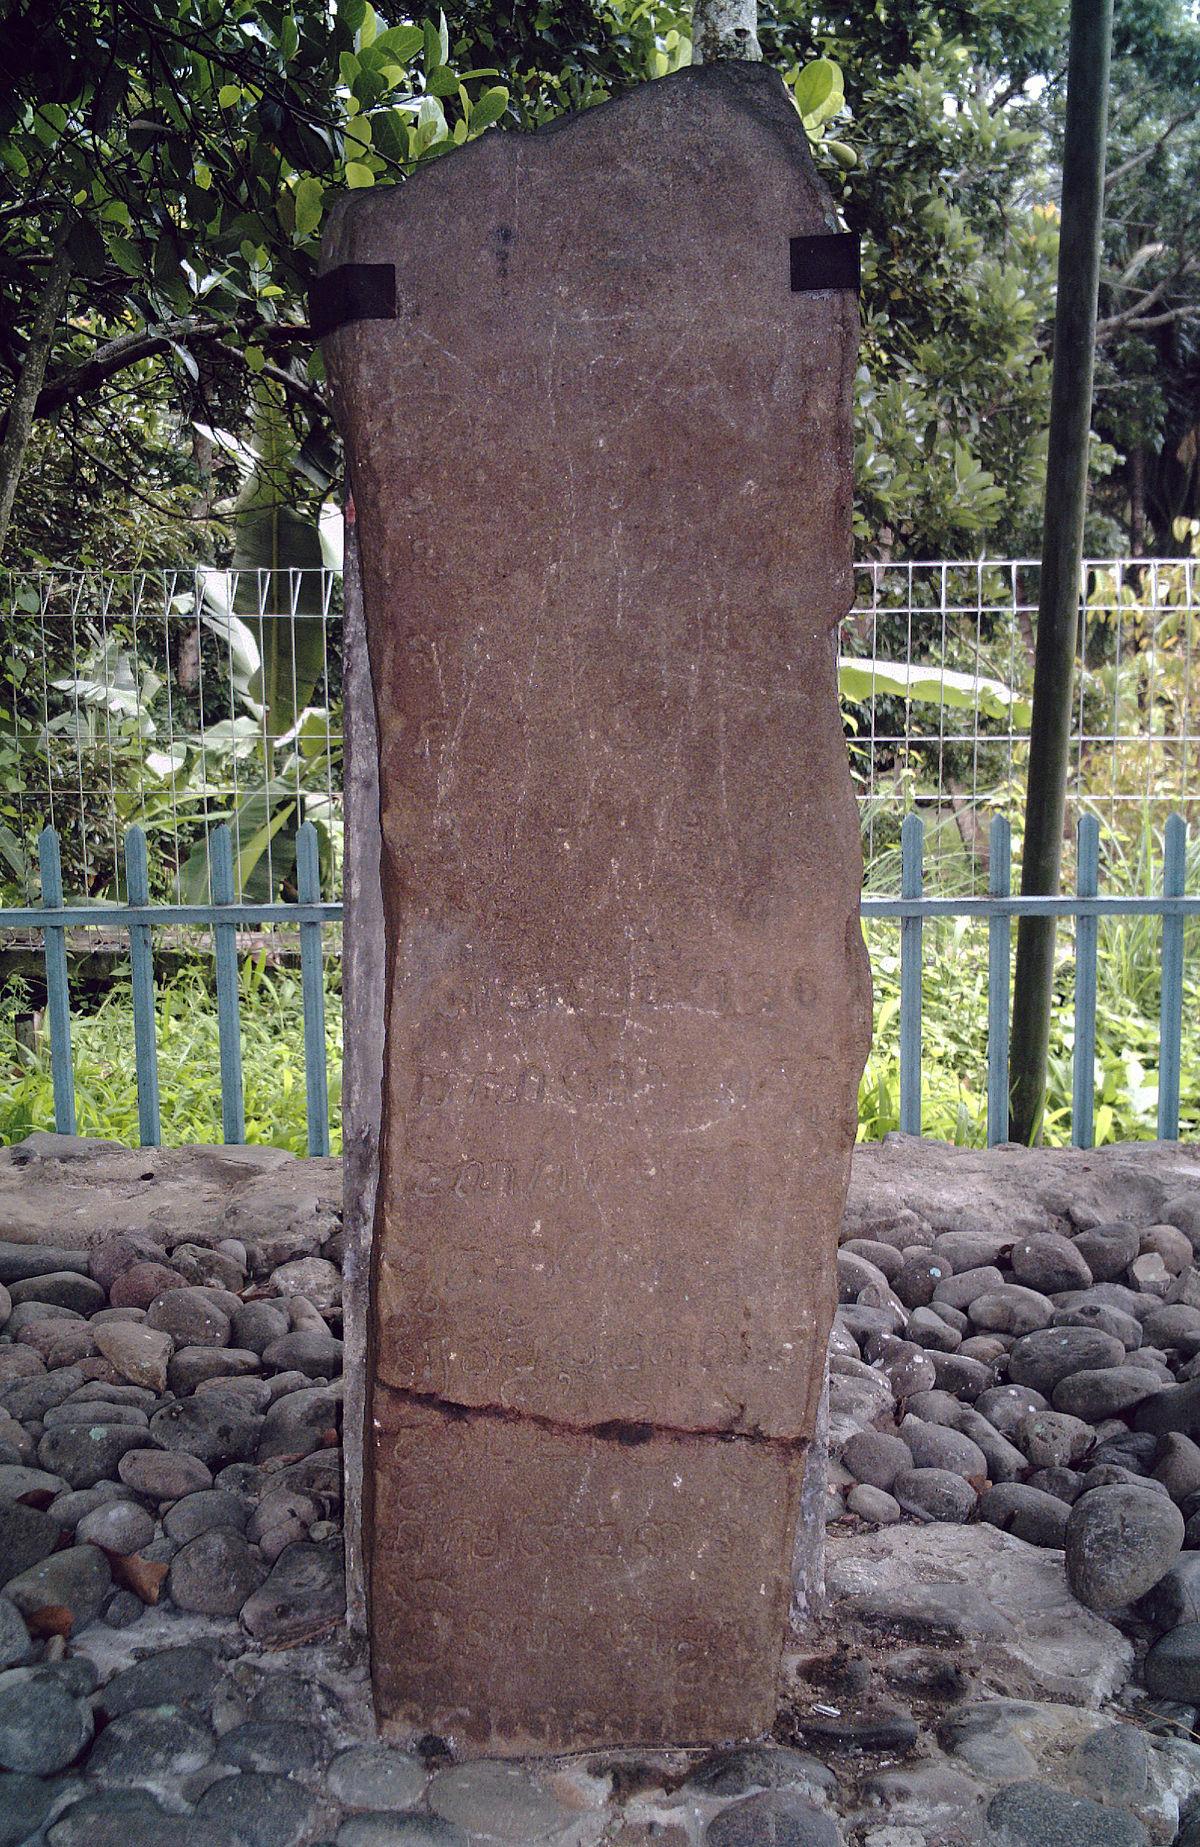 Limo Kaum Lima Kaum Tanah Datar  Wikipedia bahasa